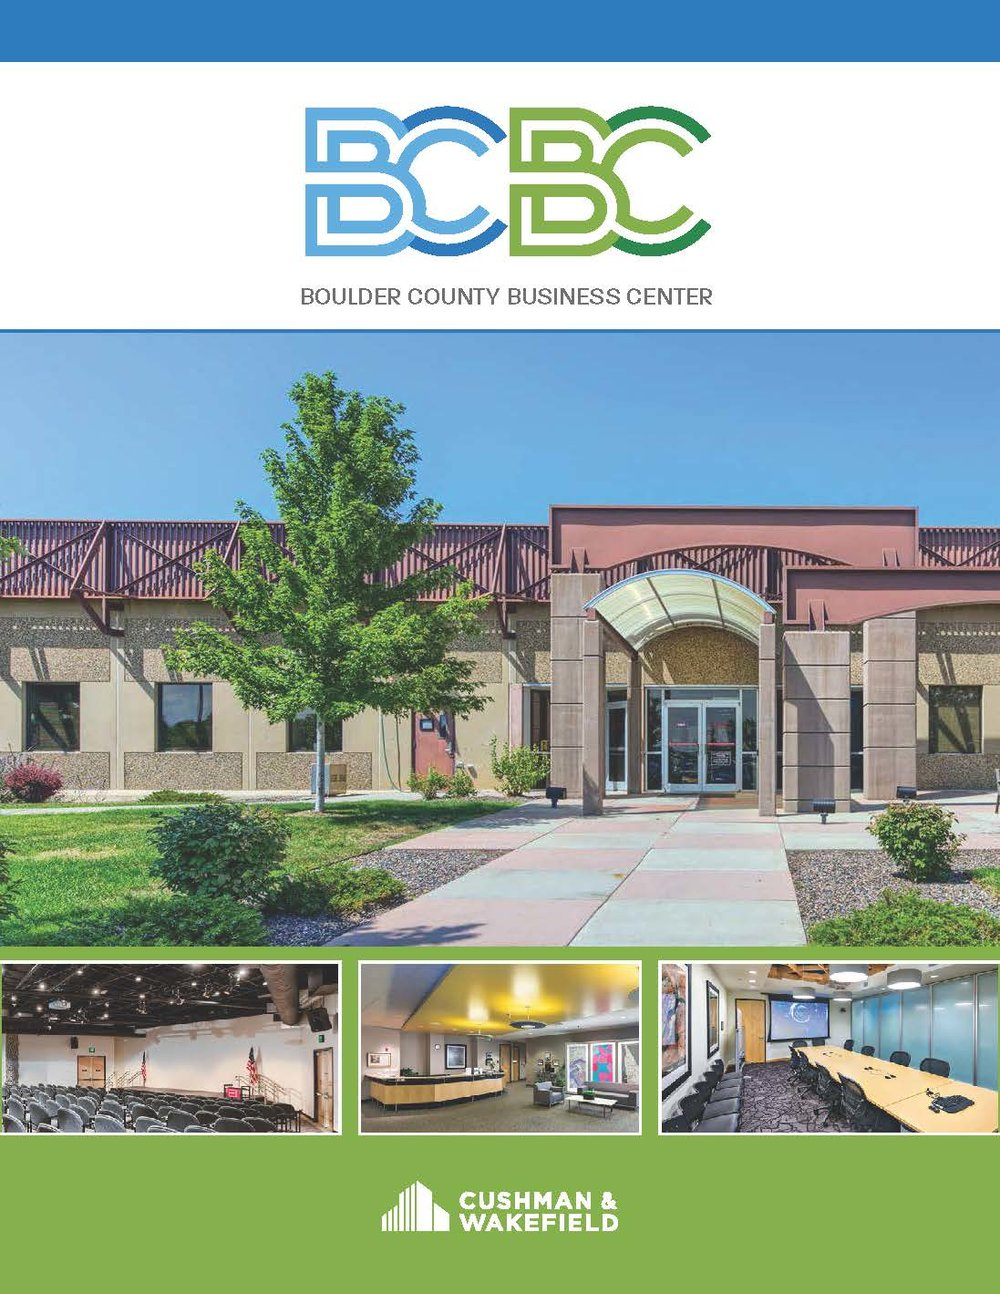 Property brochure with custom branding